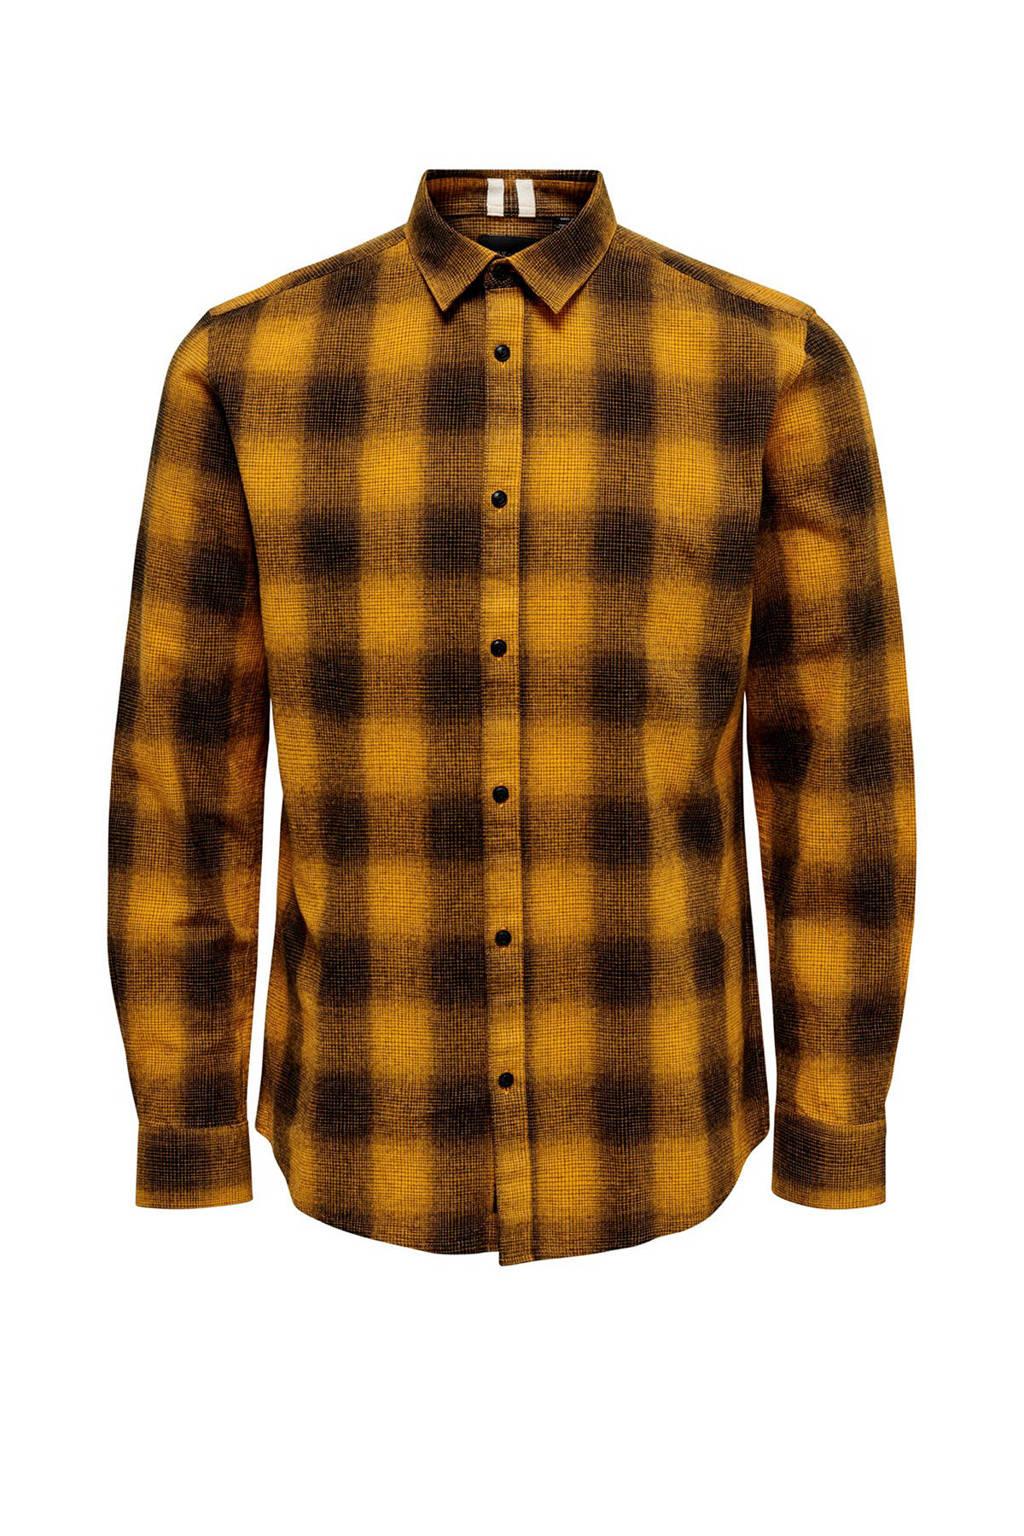 ONLY & SONS geruit slim fit overhemd geel/zwart, Geel/zwart